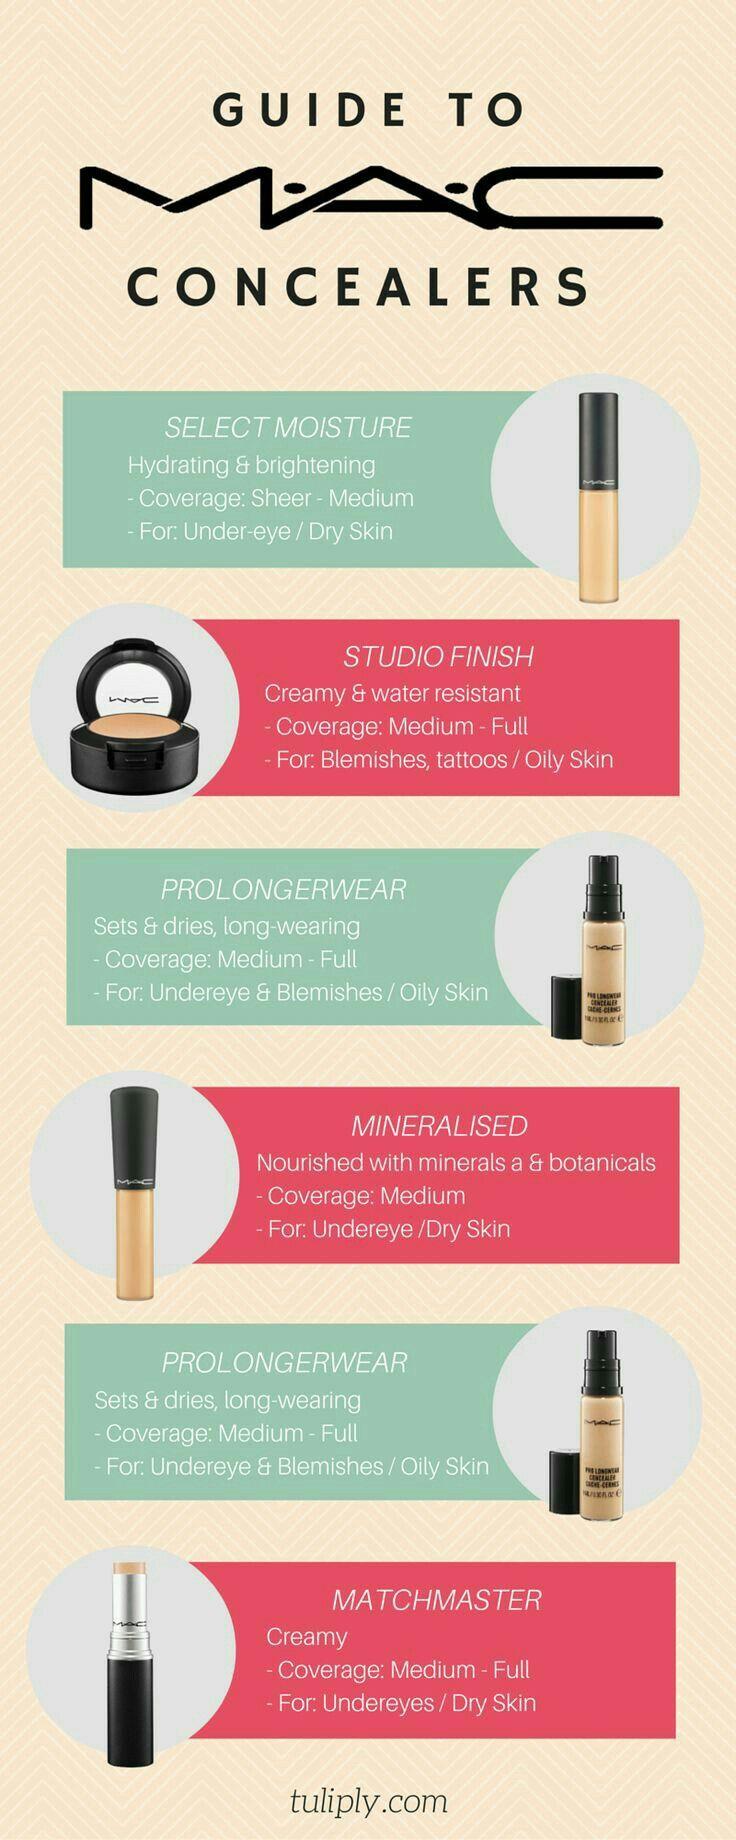 66 best Lipstick mixes images on Pinterest | Beauty makeup, Make up ...